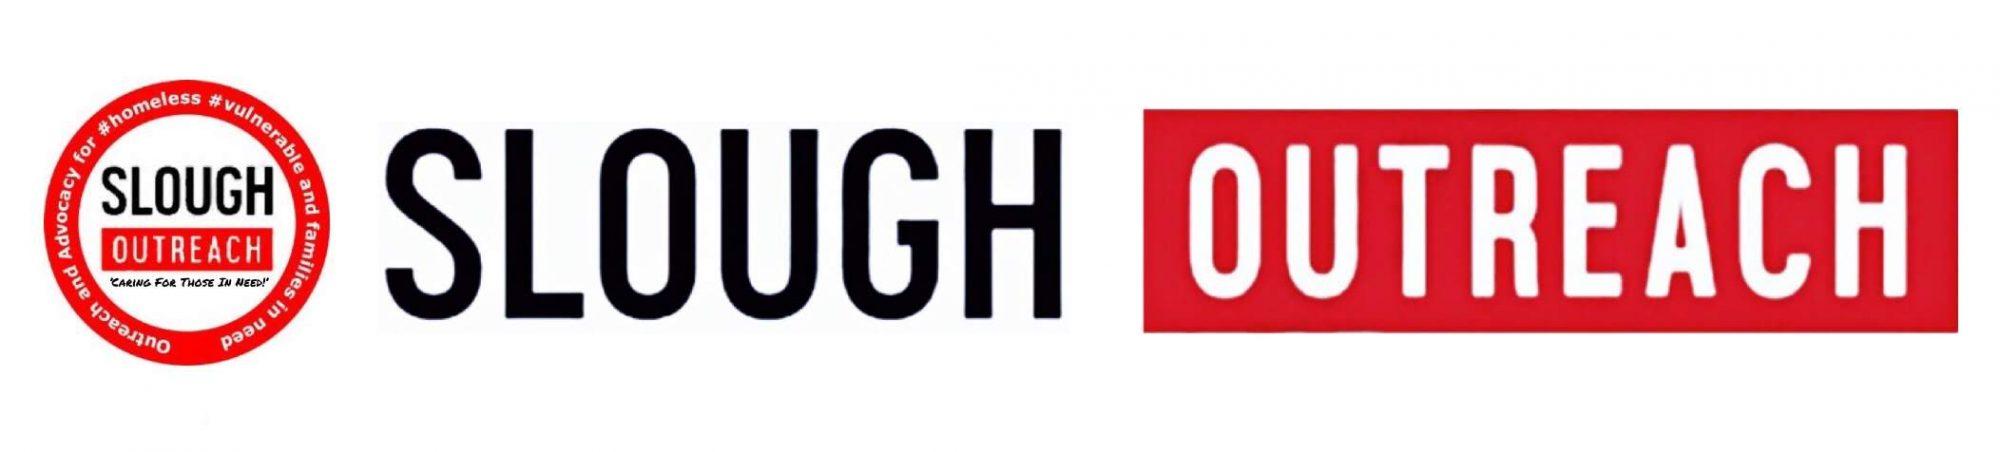 Slough Outreach